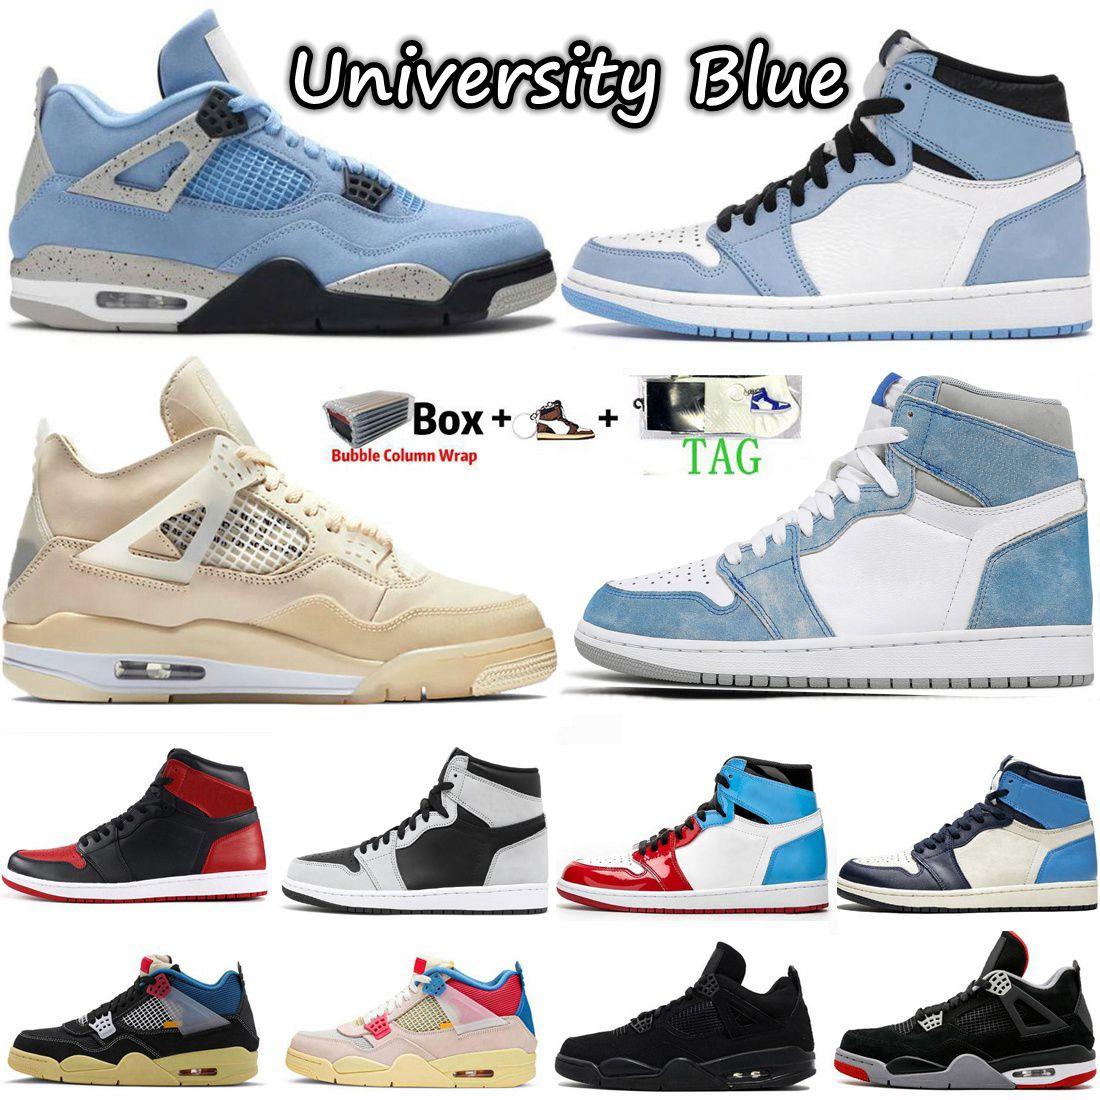 1 High OG Travis Scotts chaussures de basket-ball Spiderman UNC top 3 1s Hommes Hommage à Home Royal Bleu Hommes Sport Designer Baskets Sneakers